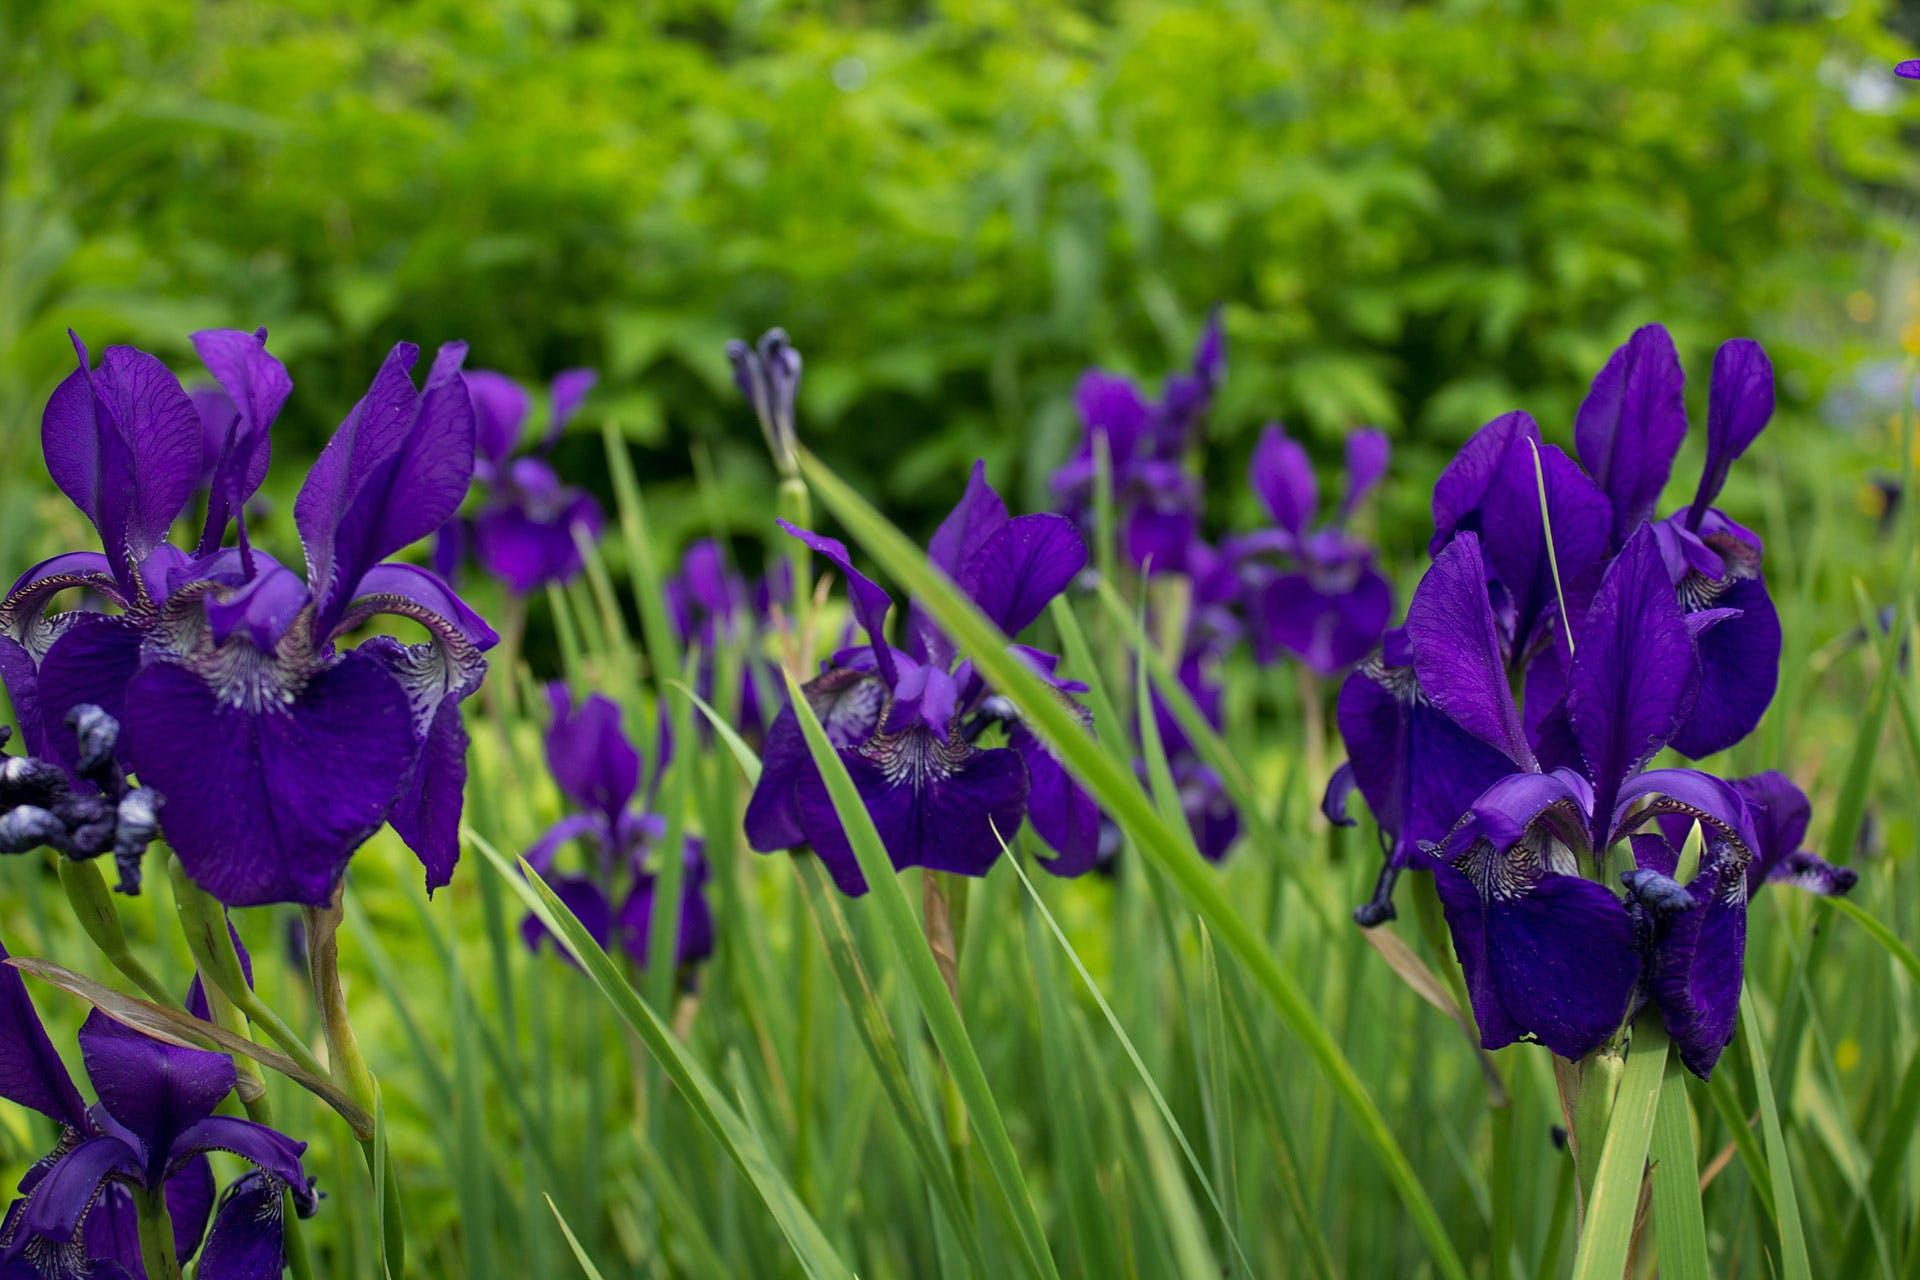 Selective Focus Photography of Iris Flowers